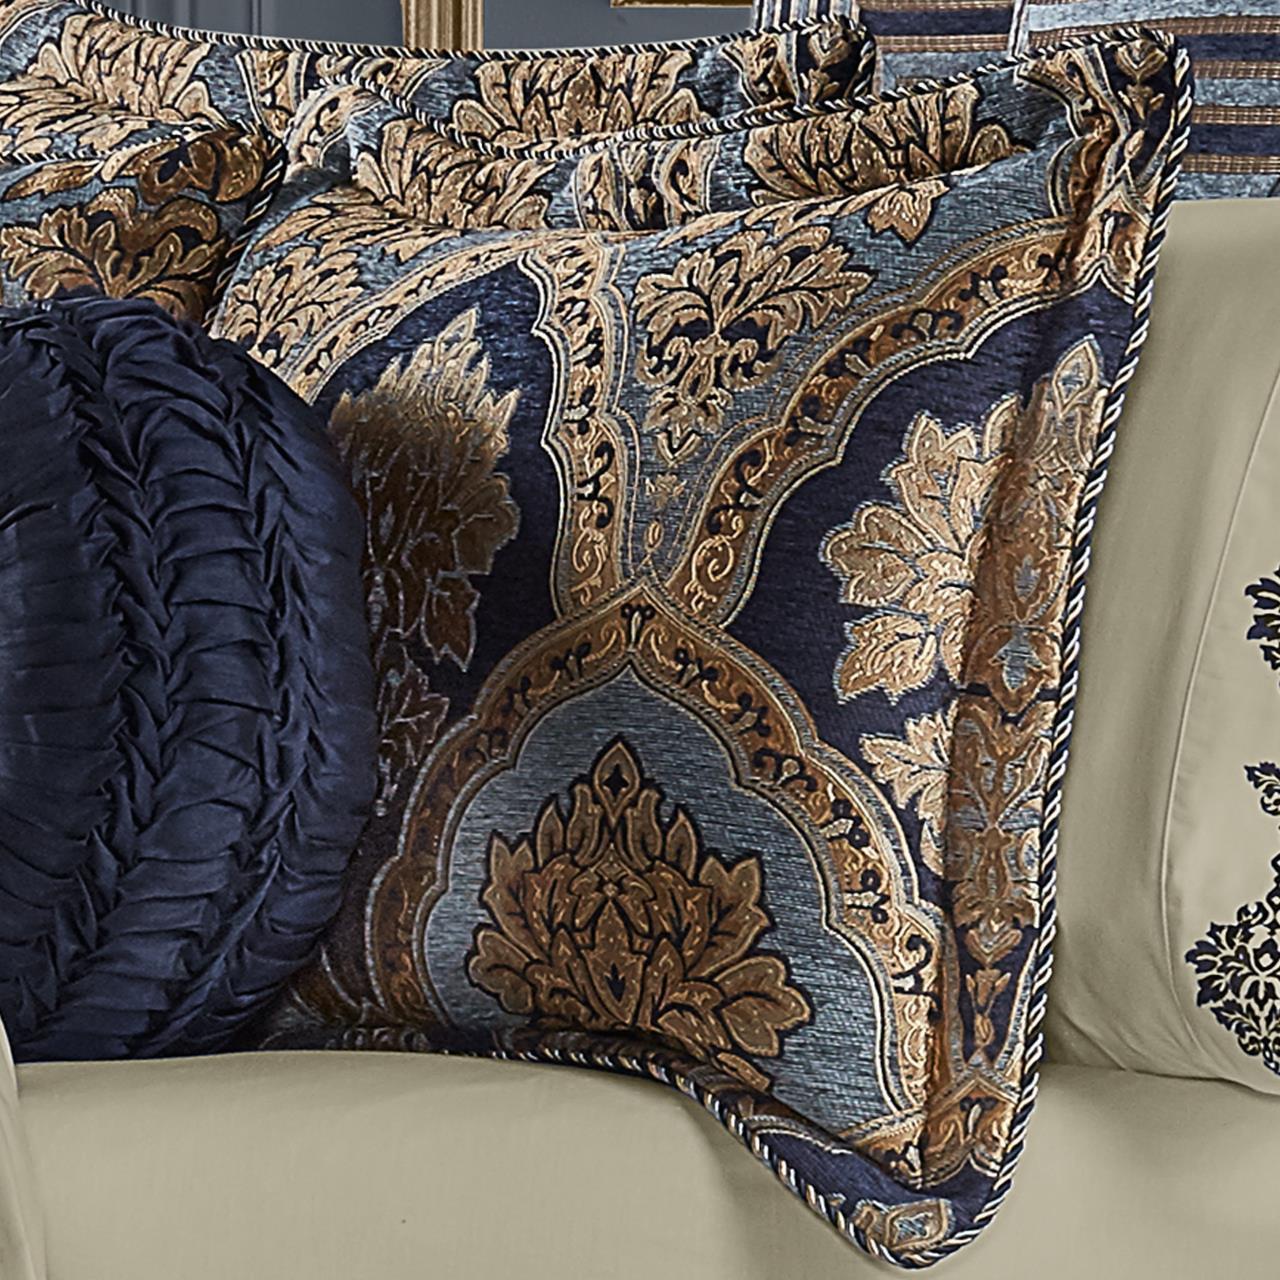 Bristol Indigo Comforter Collection - 193842112489